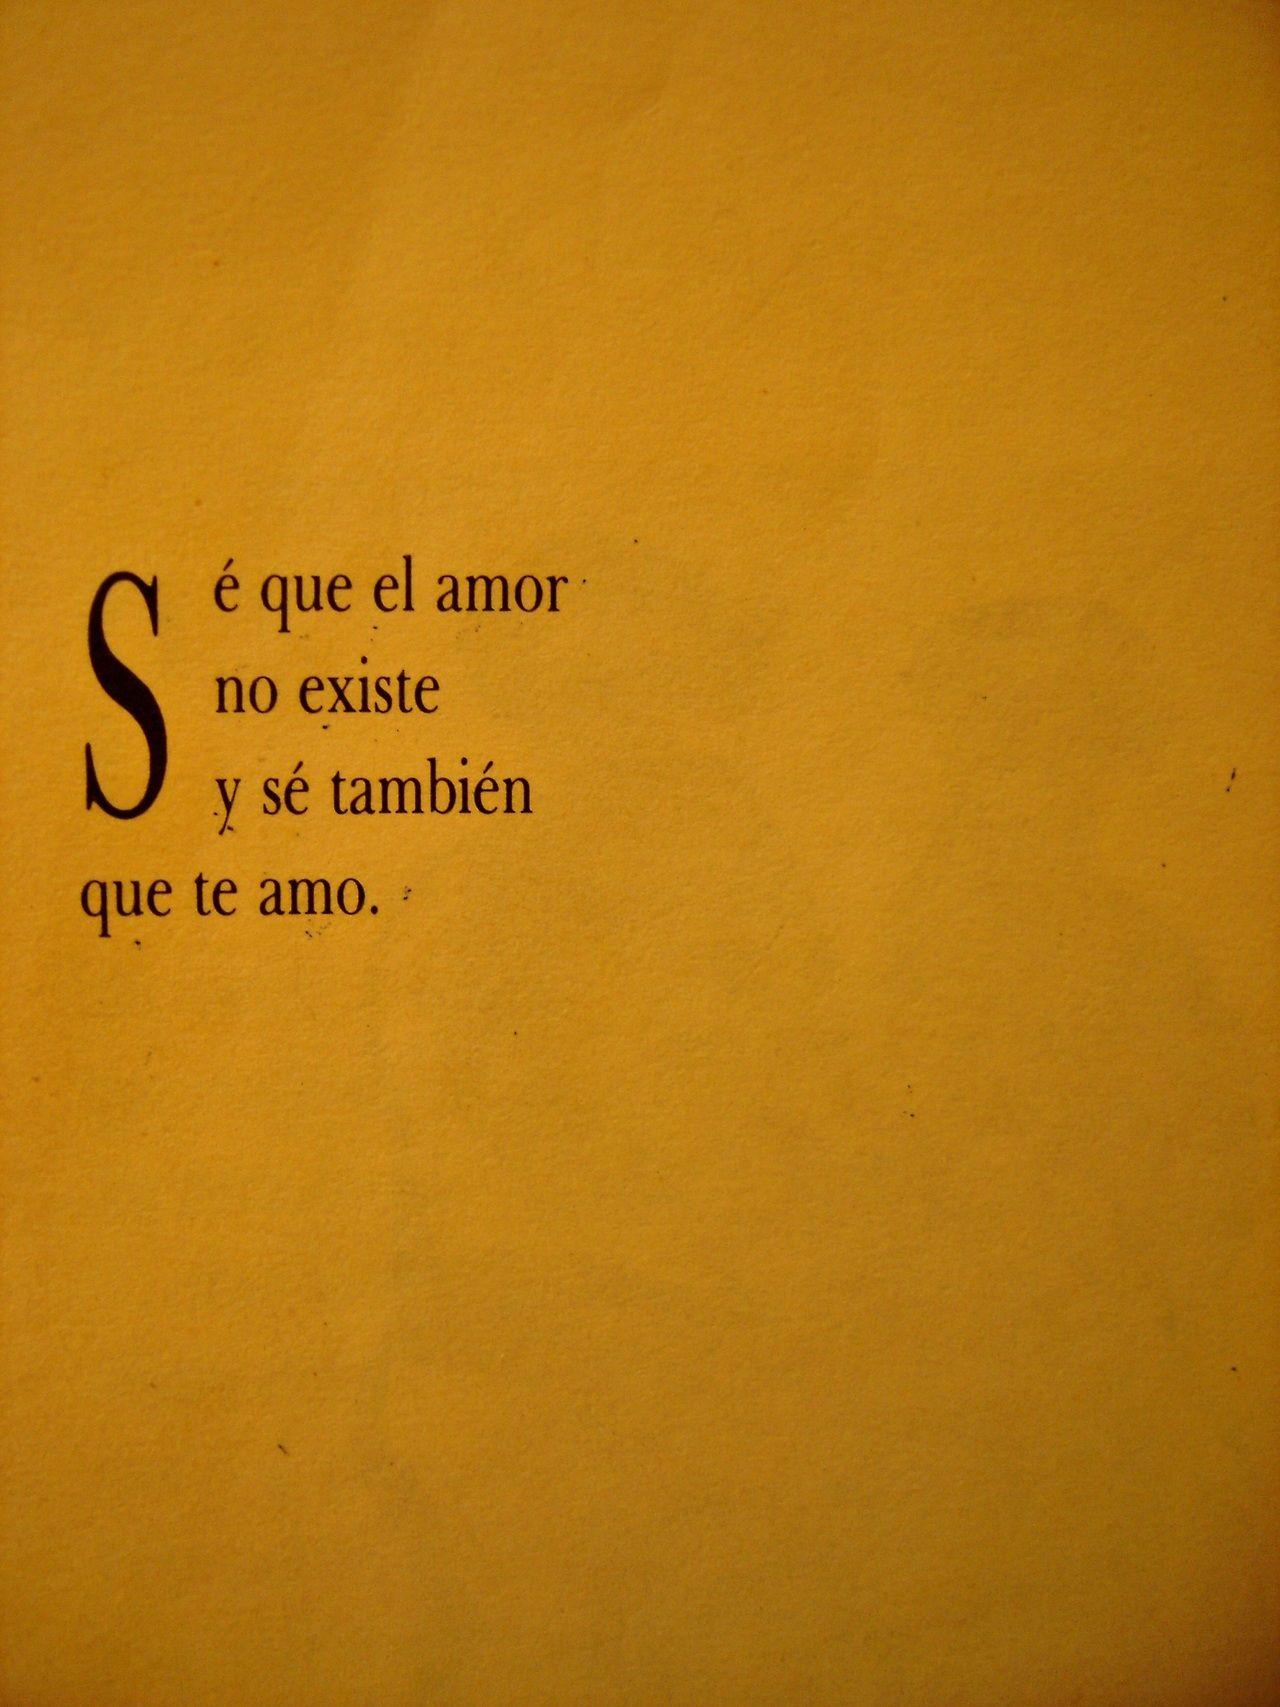 10 Frases De Amor Tumblr Lindas Espanol Mejor Casa Sobre Frases De